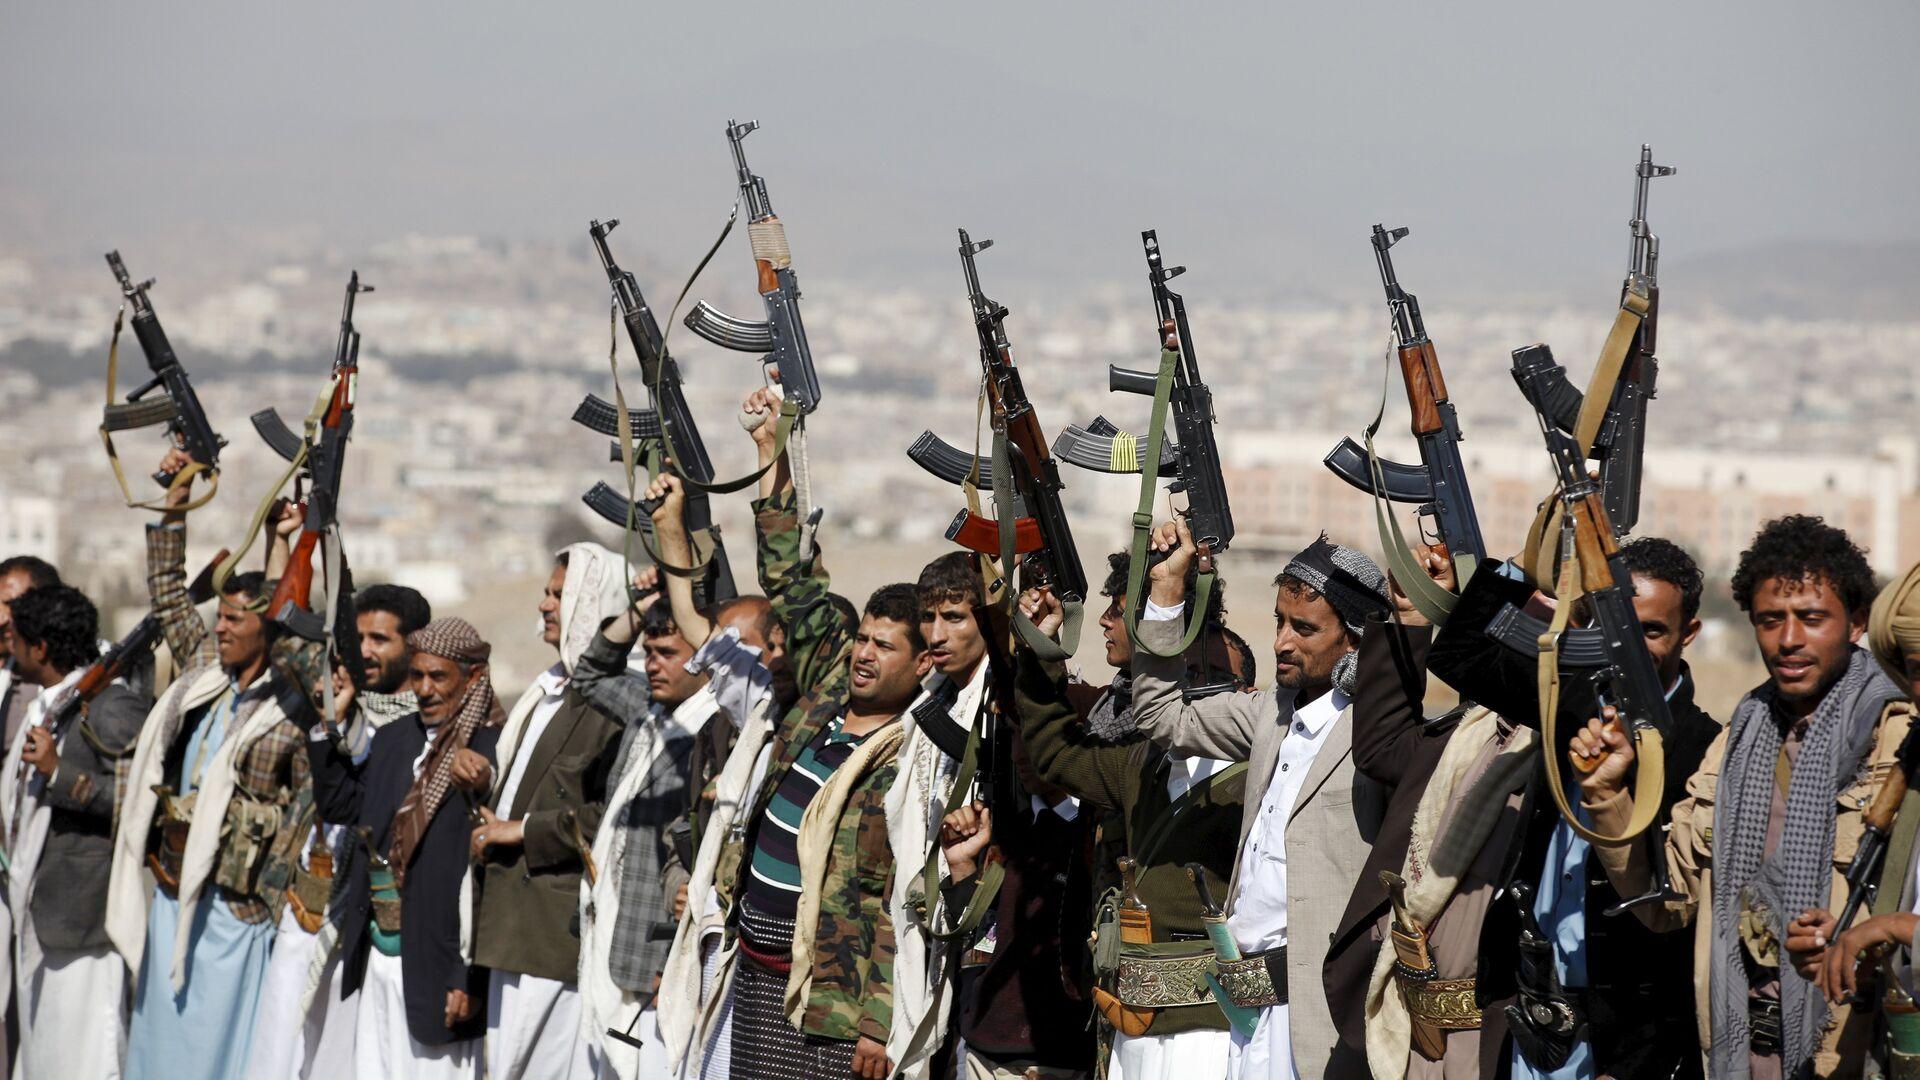 Hutíes en Yemen - Sputnik Mundo, 1920, 12.04.2021